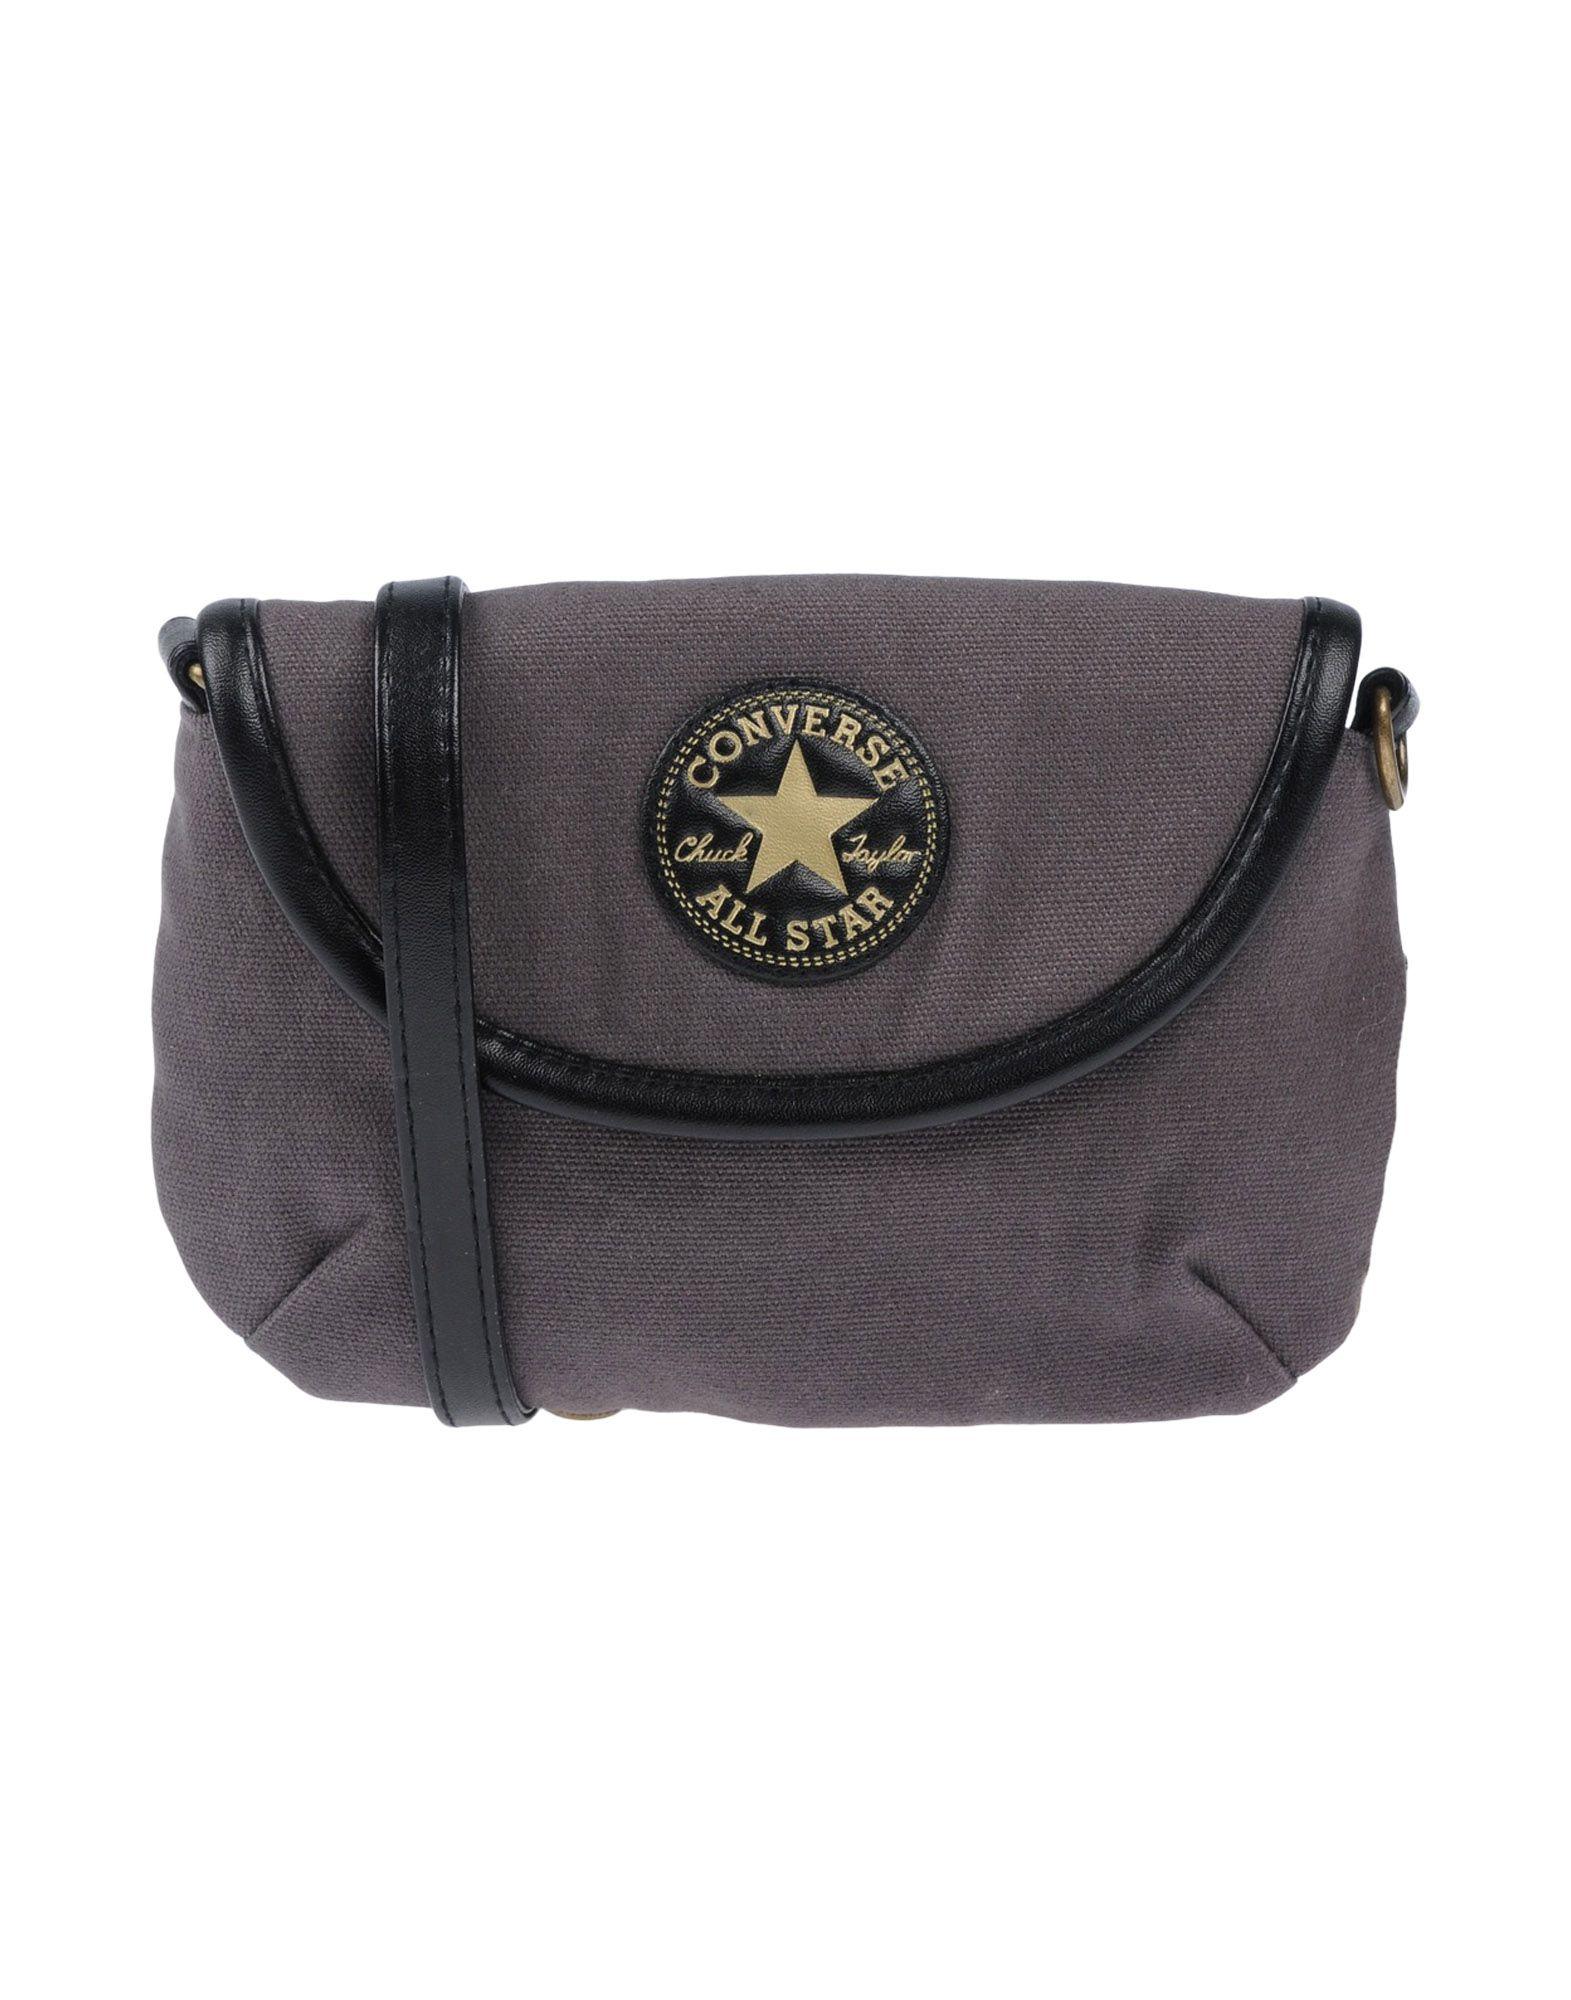 CONVERSE ALL STAR Сумка на руку inov 8 сумка all terrain kitbag black